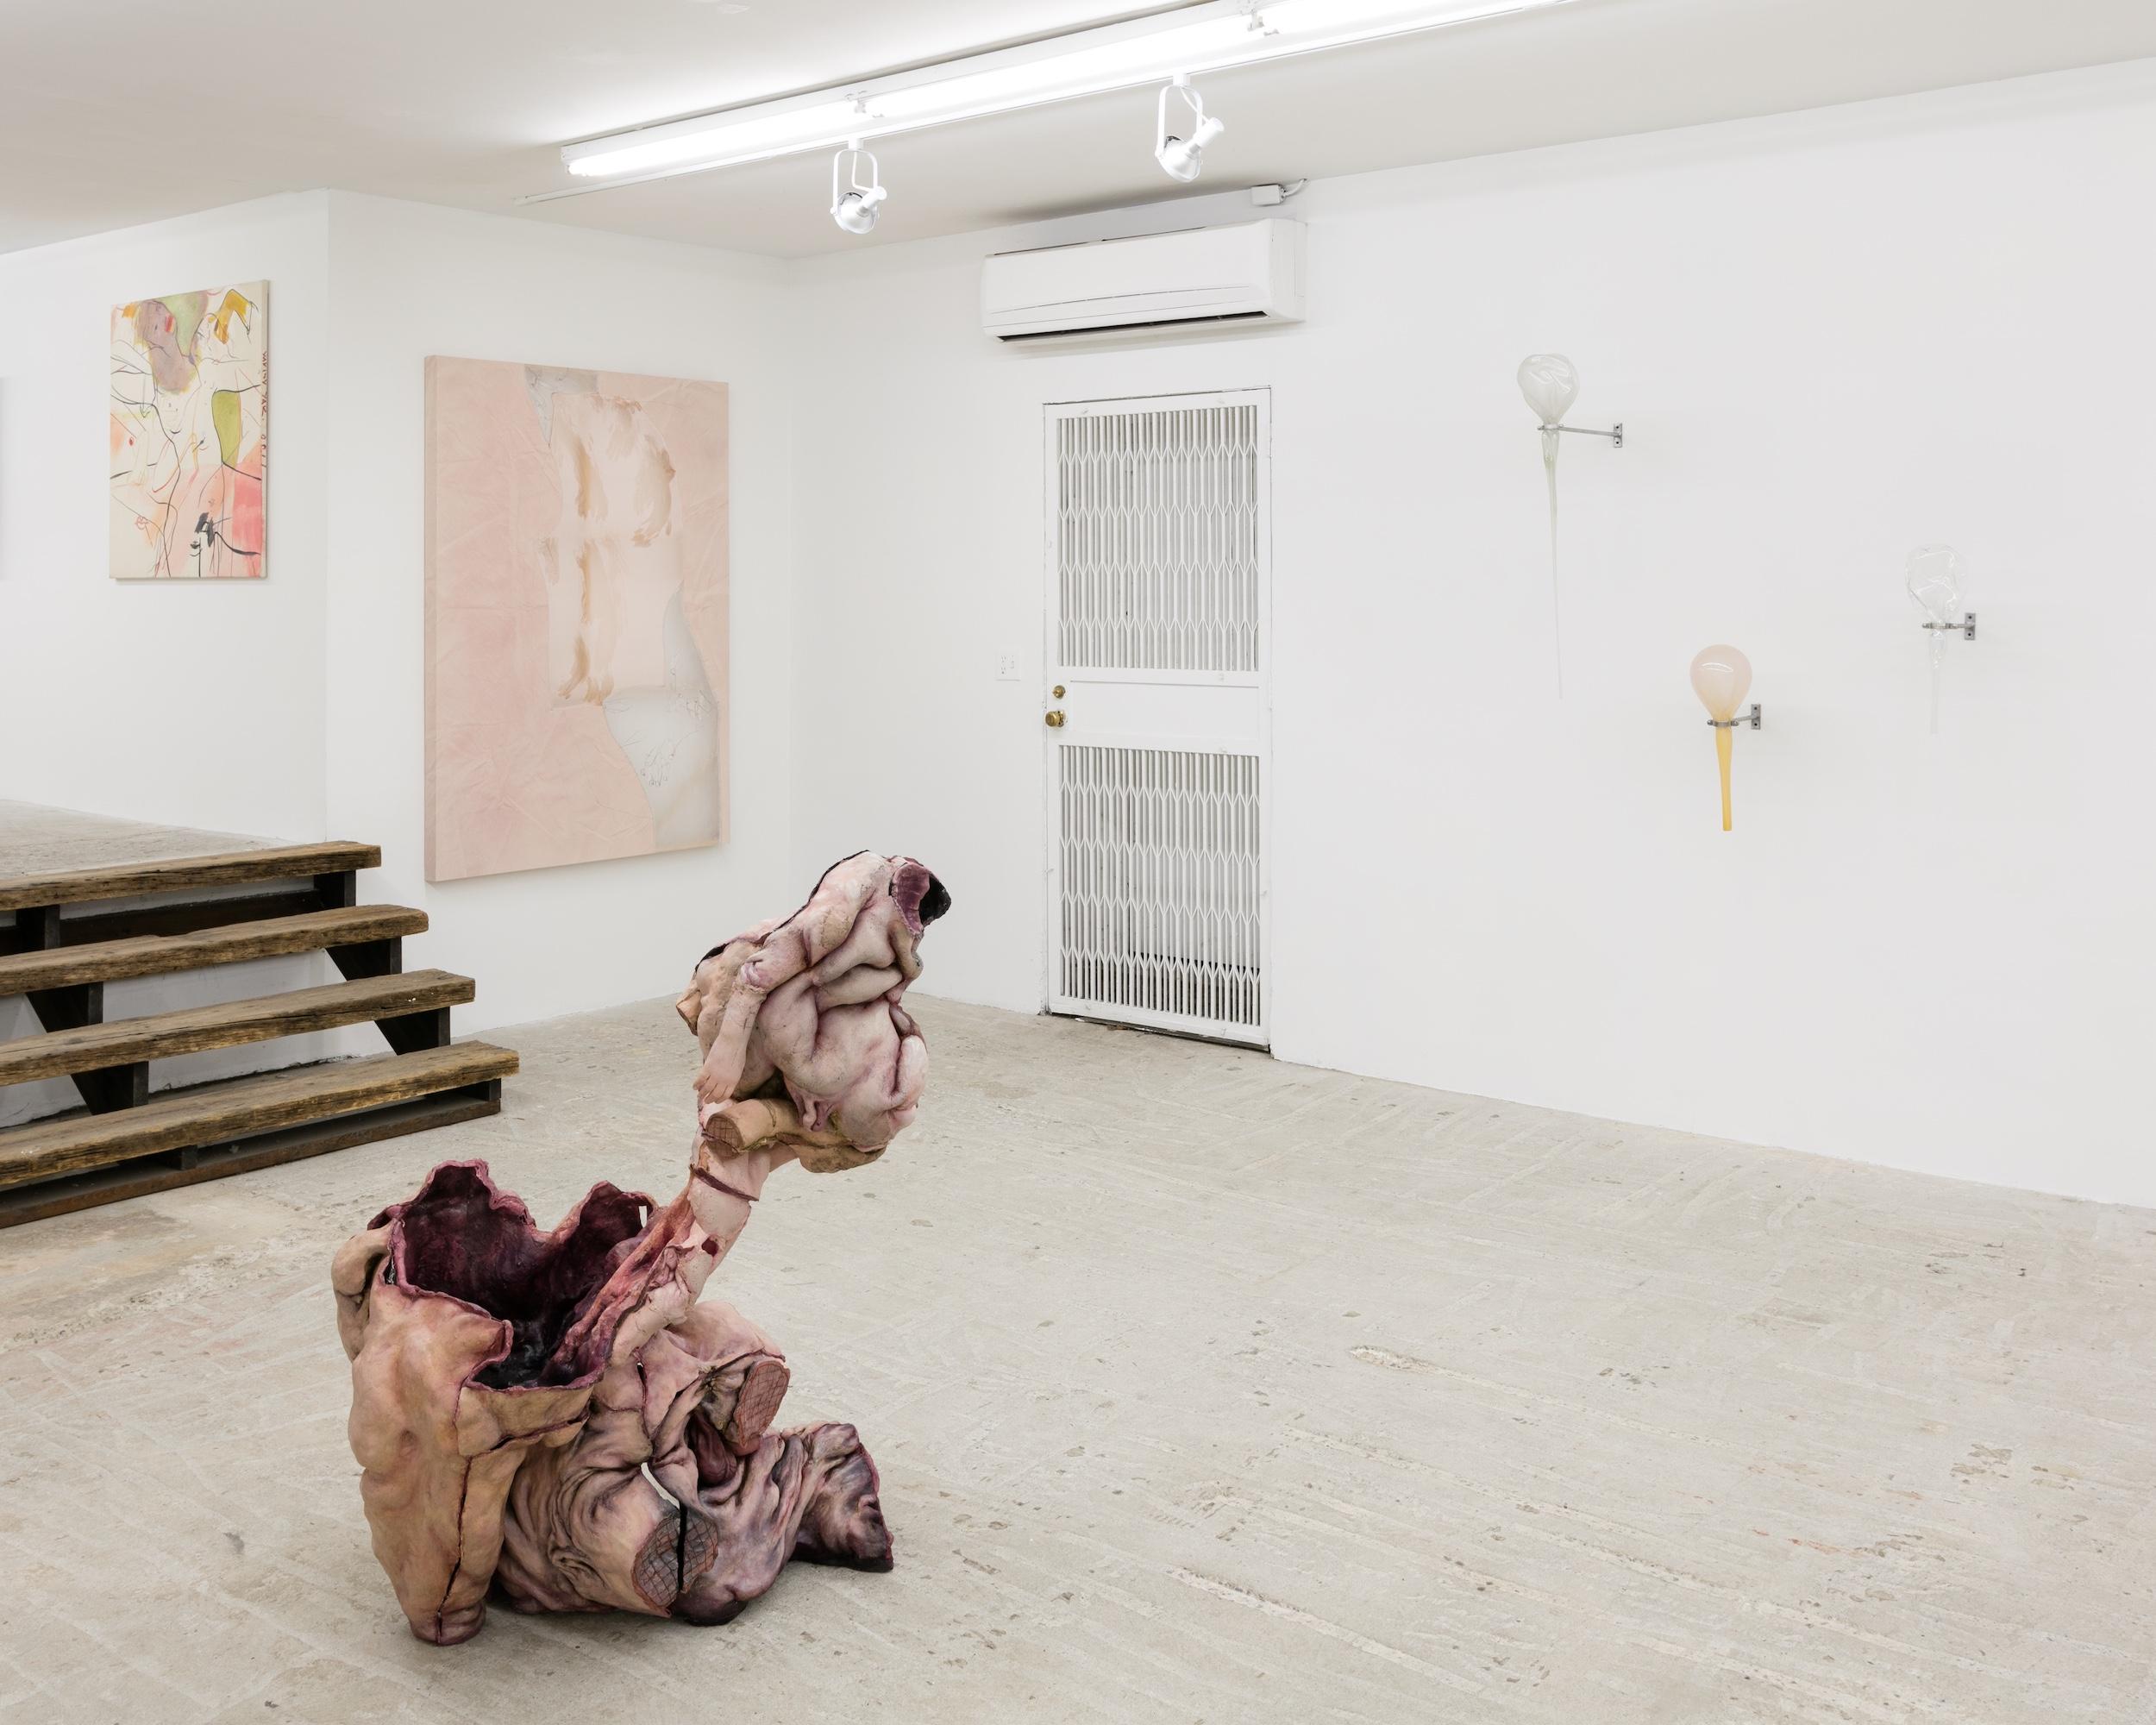 Dead Eden,  Installation view at Lyles & King, June 6 - August 3, 2018